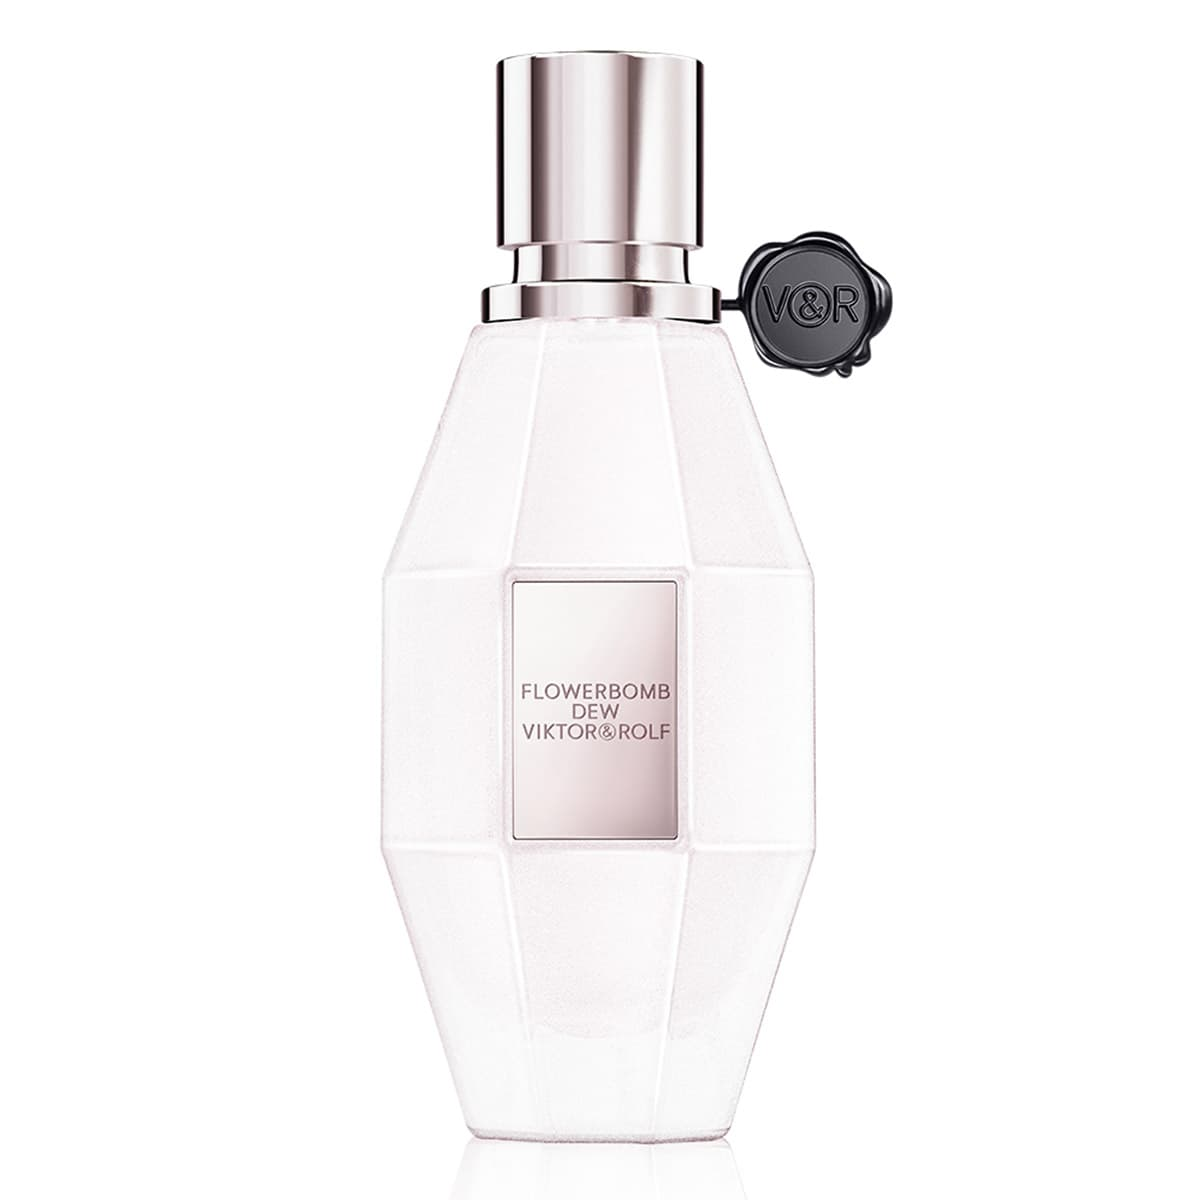 Flowerbomb Dew - Eau de Parfum VIKTOR & ROLF